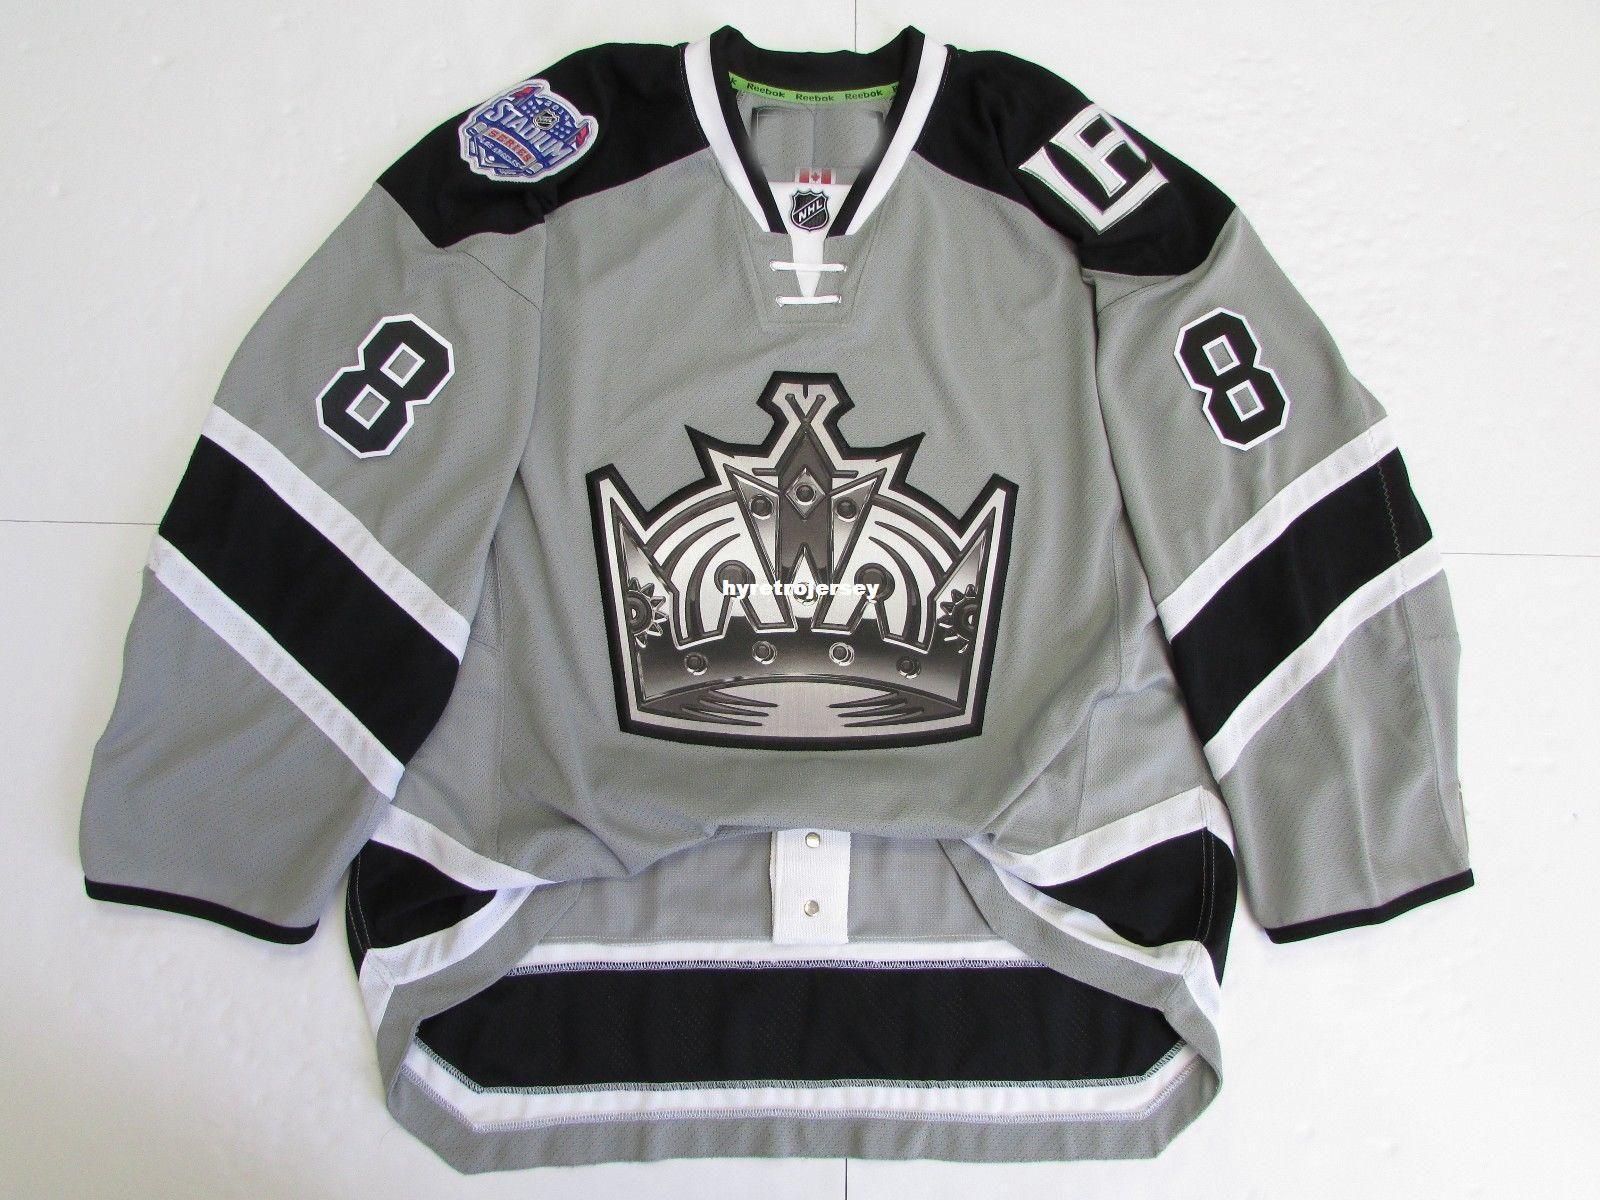 Cheap Custom DREW DOUGHTY LOS ANGELES KINGS 2014 STADIUM SERIES JERSEY  Stitch Add Any Number Any Name Mens Hockey Jersey GOALIE CUT 5XL Retro  Hockey Jersey ... 0b9c5ad03